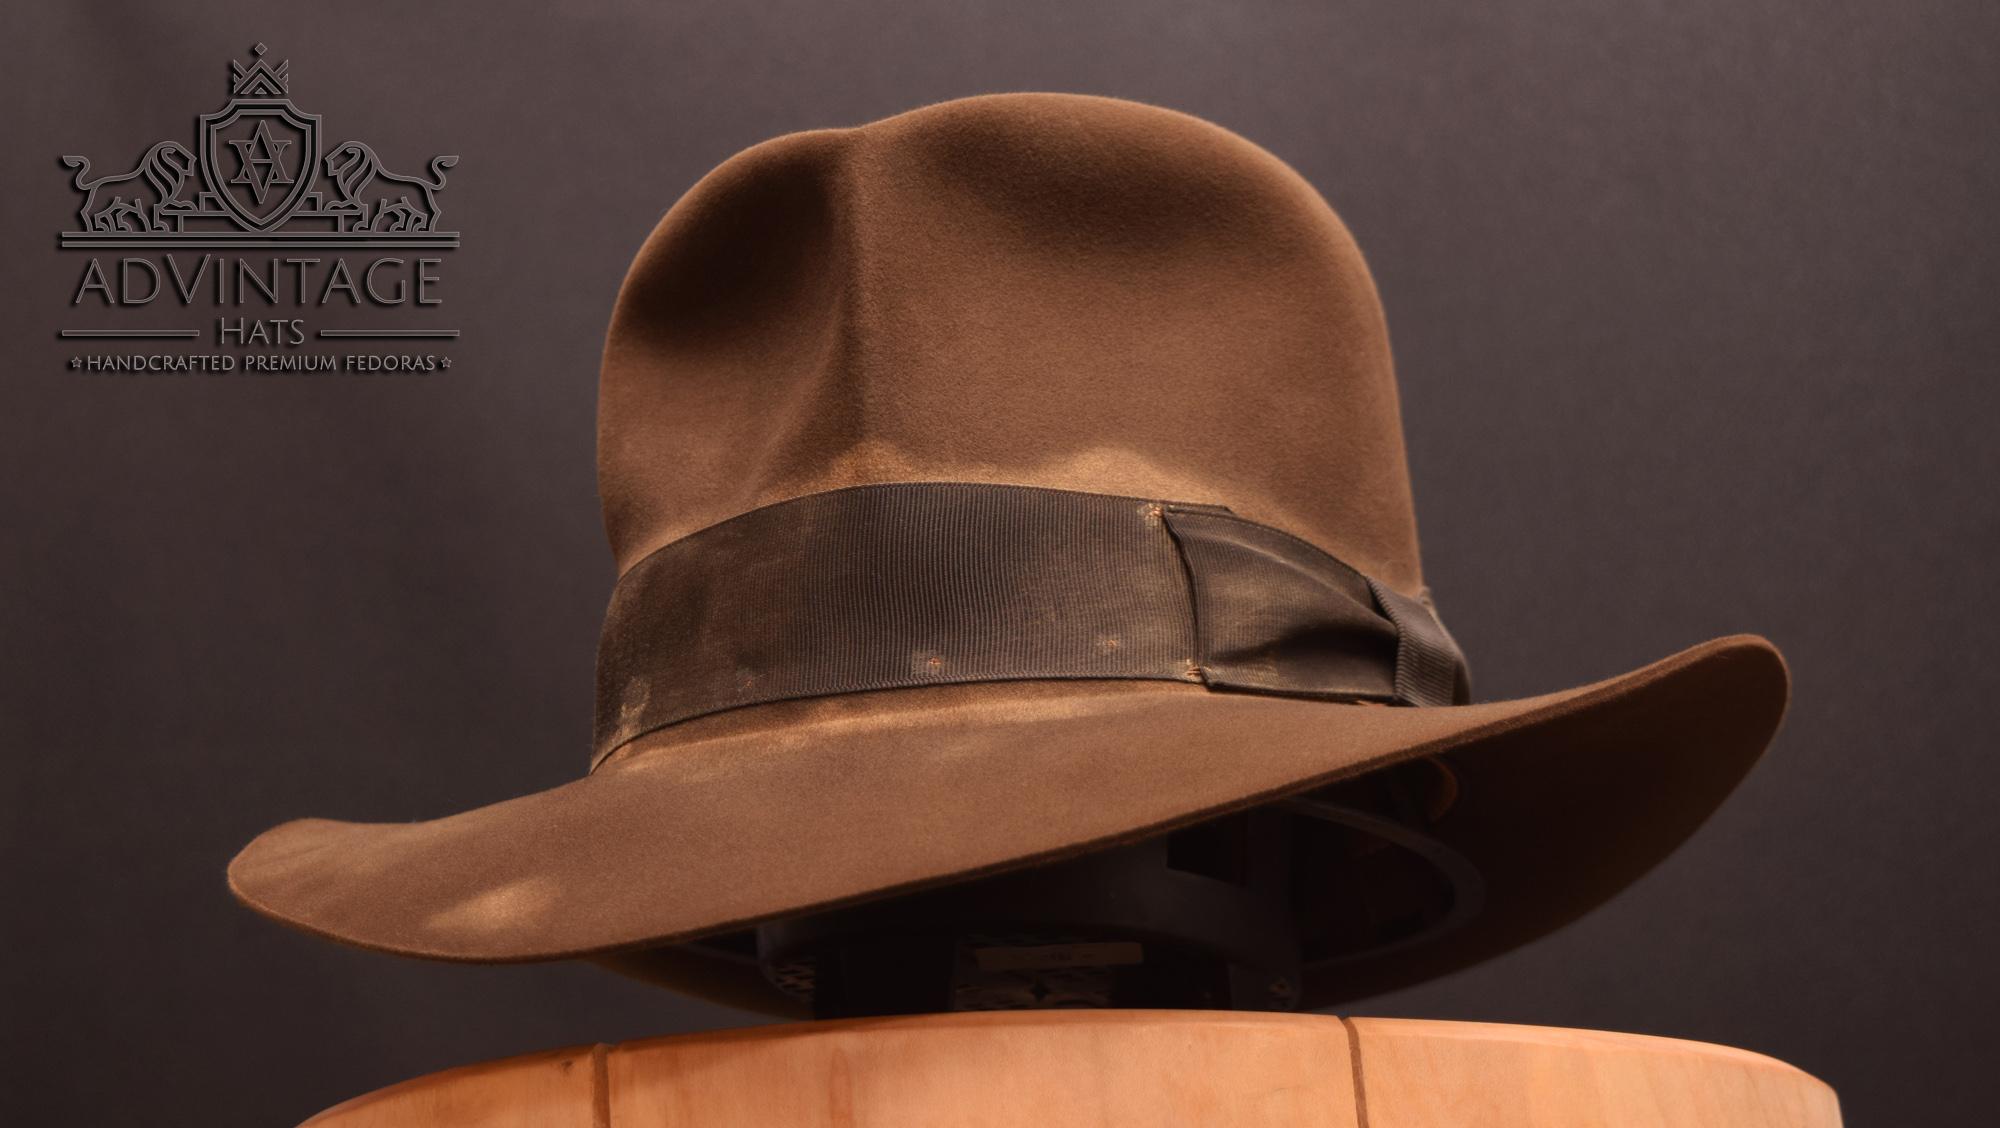 streets of cario truck scene soc fedora hut hat indiana jones indy true-sable hero advintage masterpiece sable